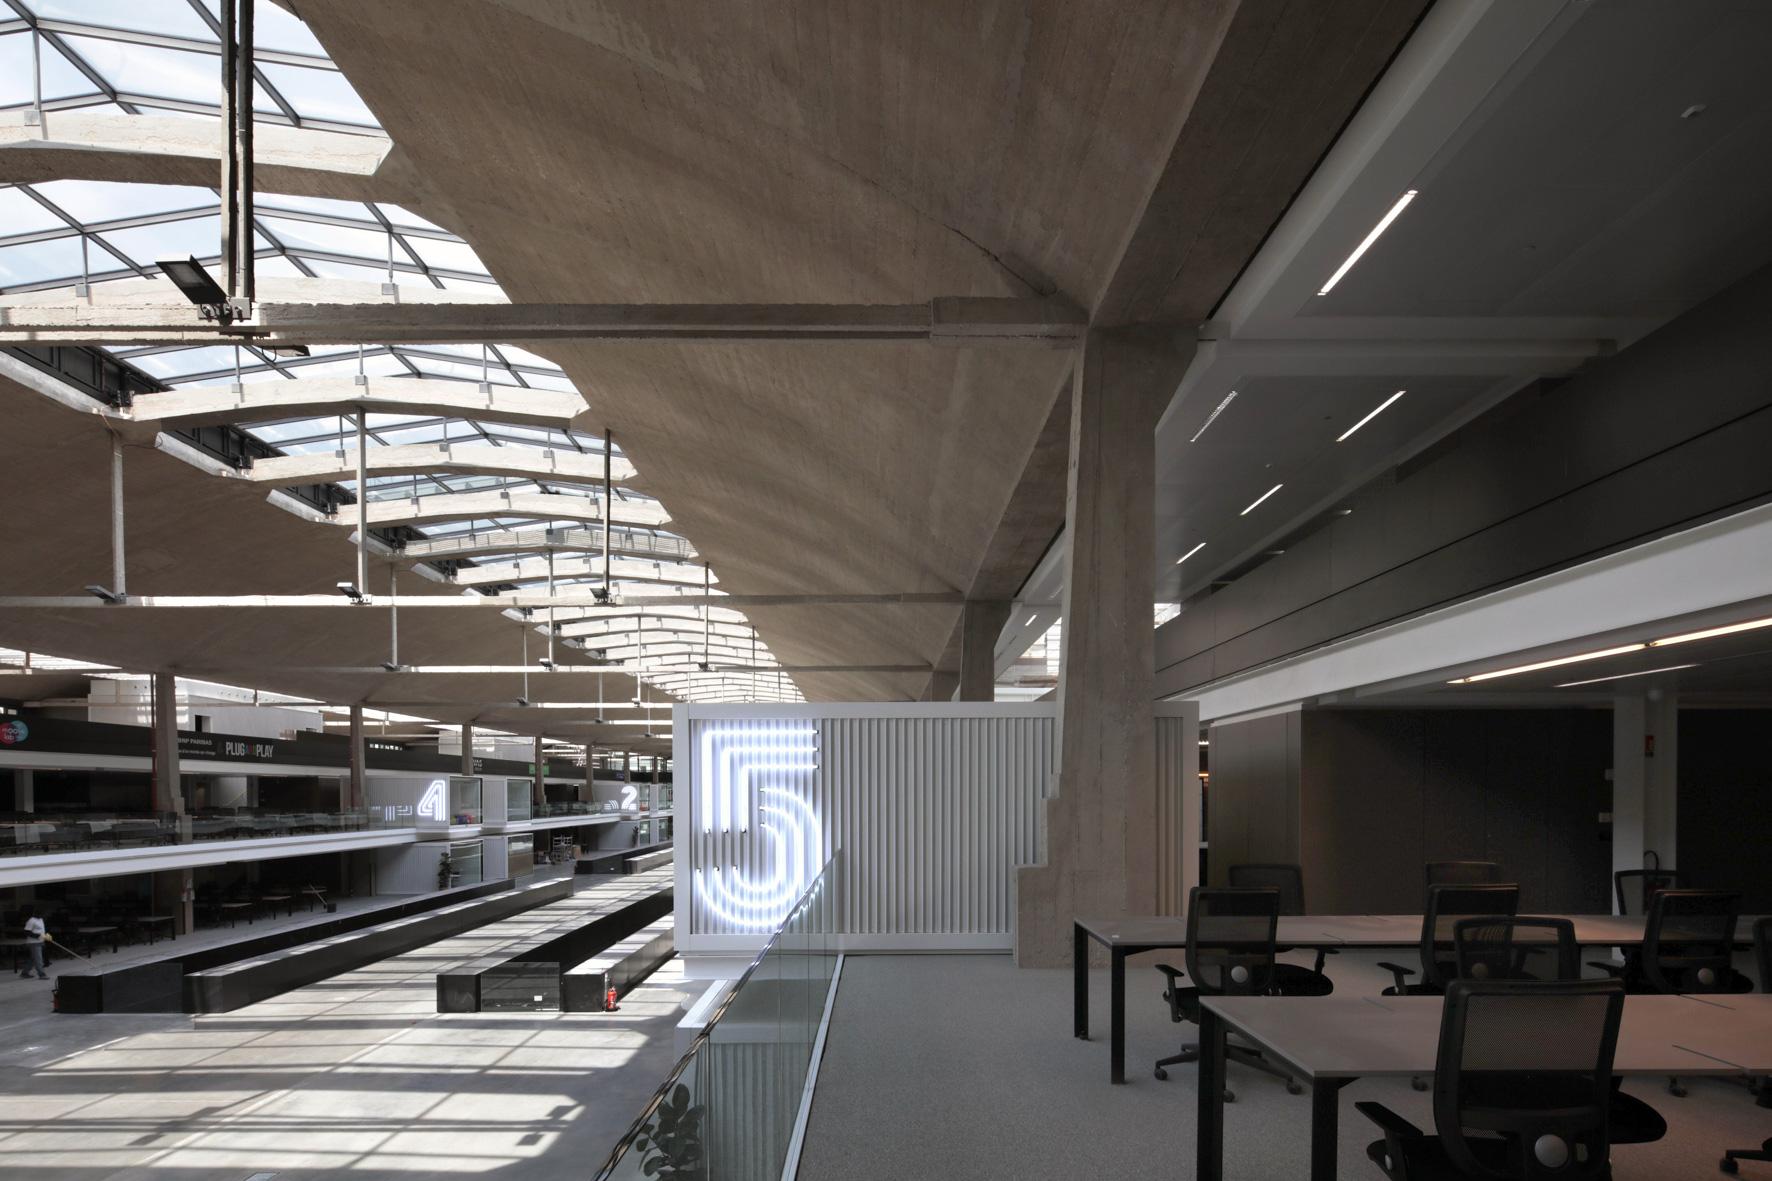 Quantcast & As Parisu0027 mega startup campus Station F opens its doors Silicon ... azcodes.com